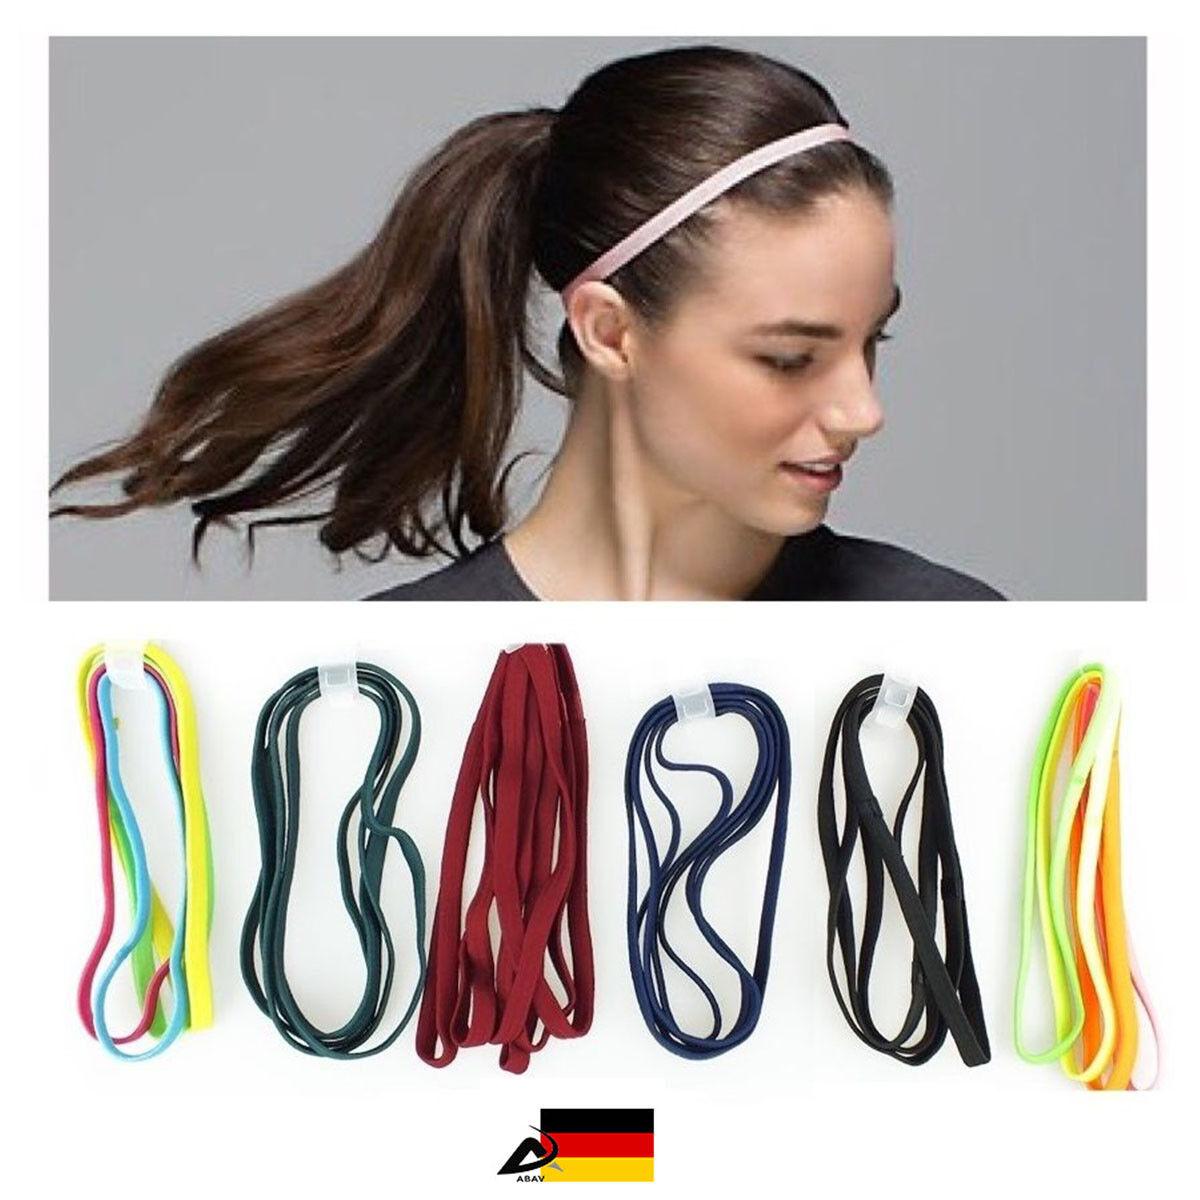 2x Haarband Stirnband Stretch Bänder Gymnastik Elastisch Band Yoga Sport Band